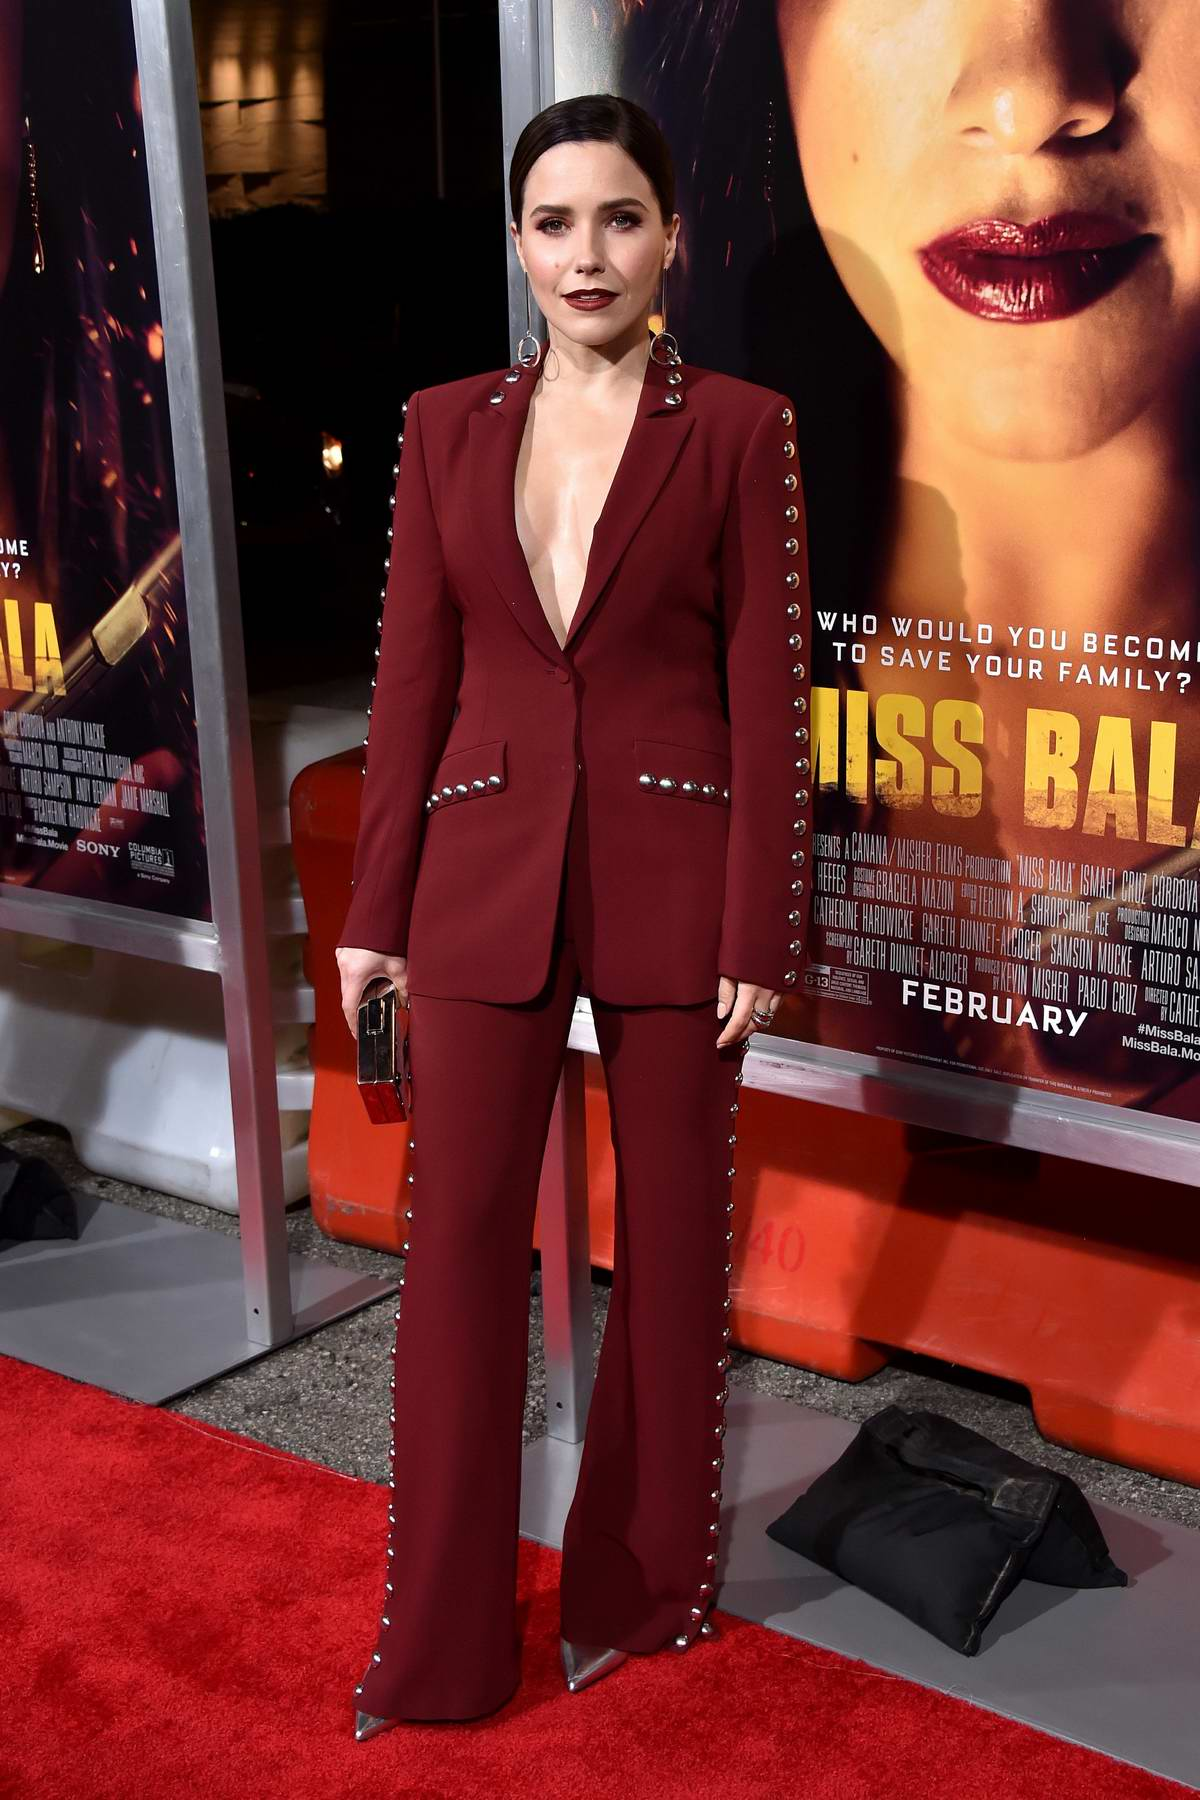 Sophia Bush attends the premiere of 'Miss Bala' at Regal LA Live Theatre in Los Angeles